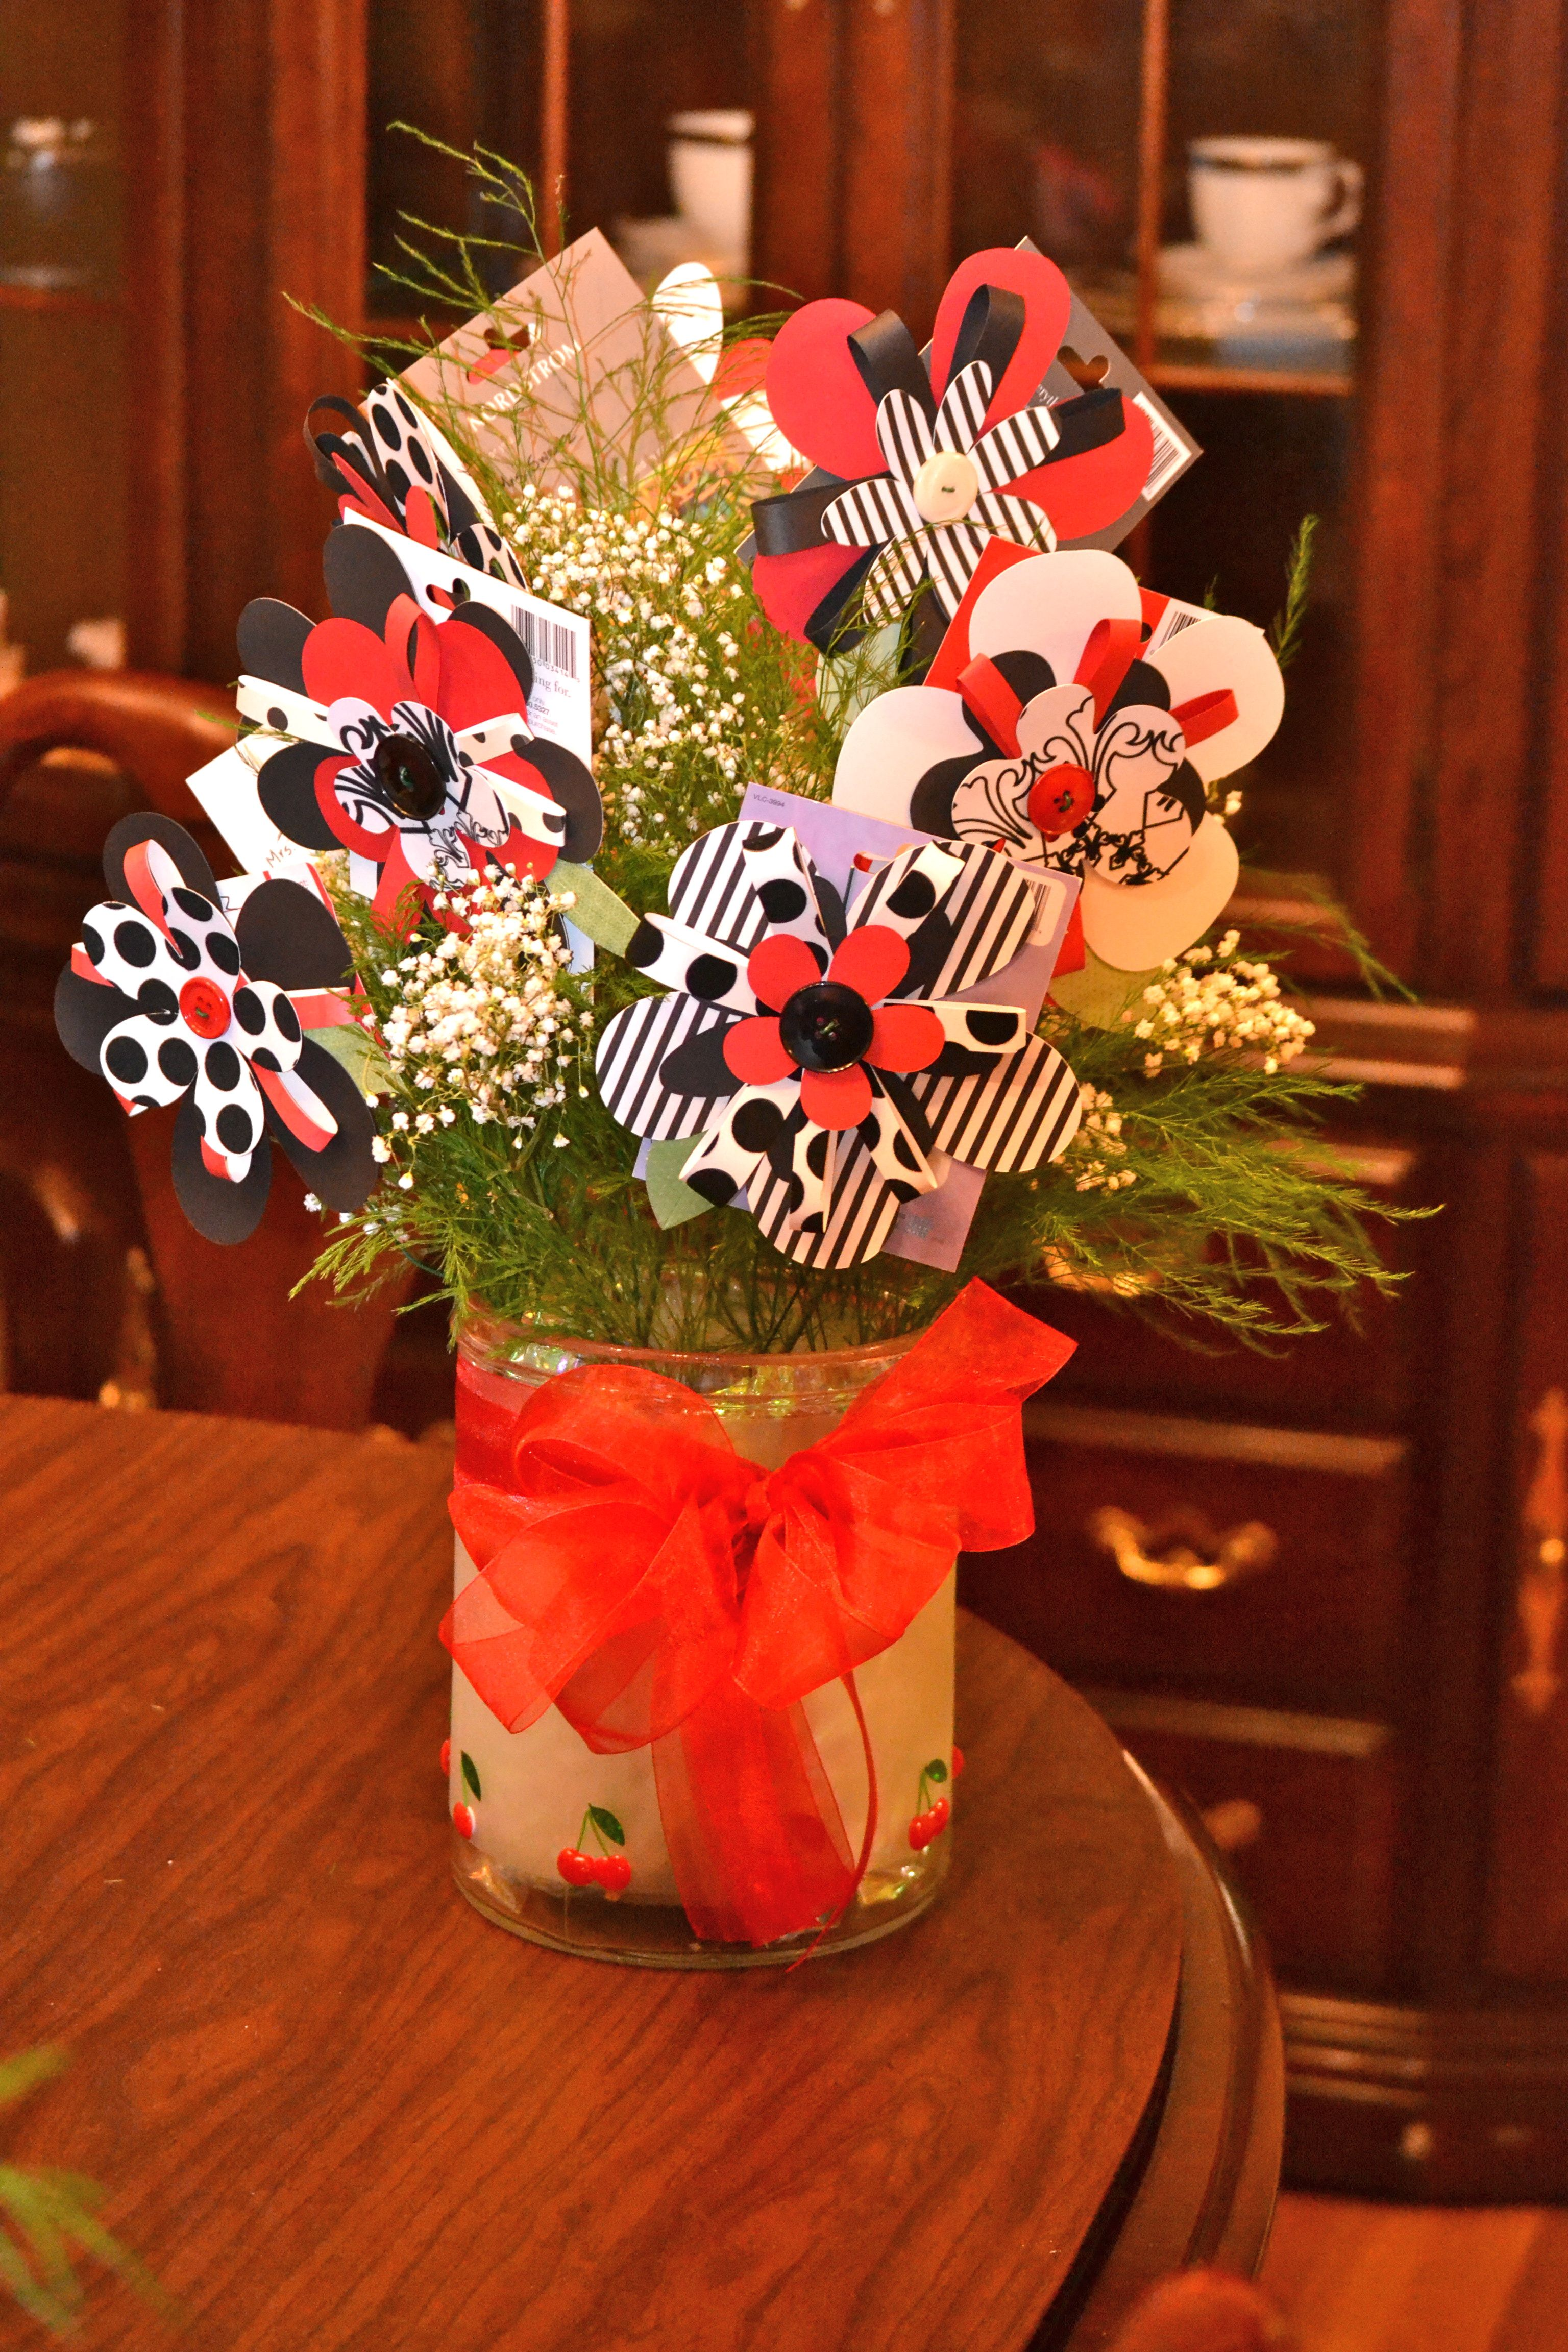 Gift card tree ideas pinterest - Gift Card Basket